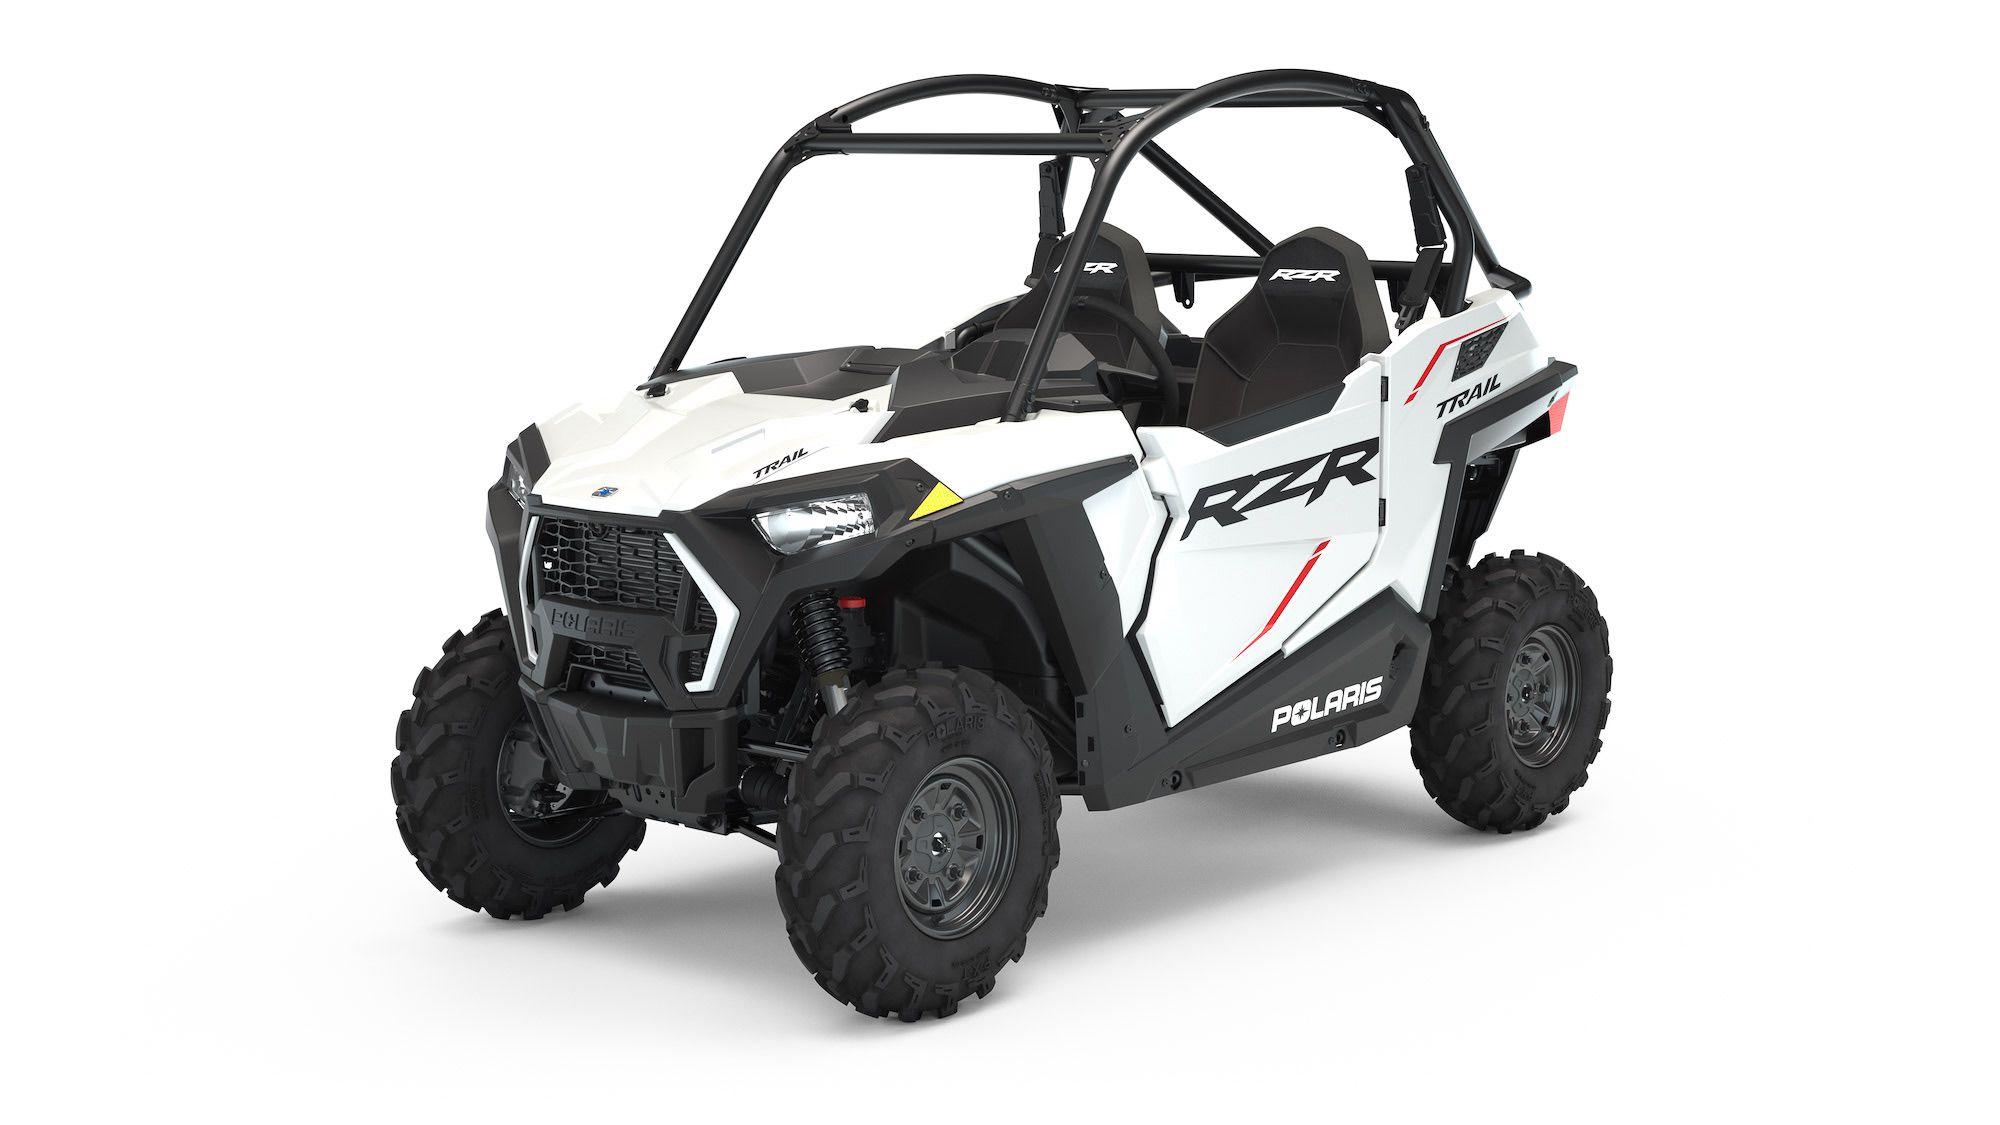 2022 Polaris RZR Trail Sport in White Lightning.